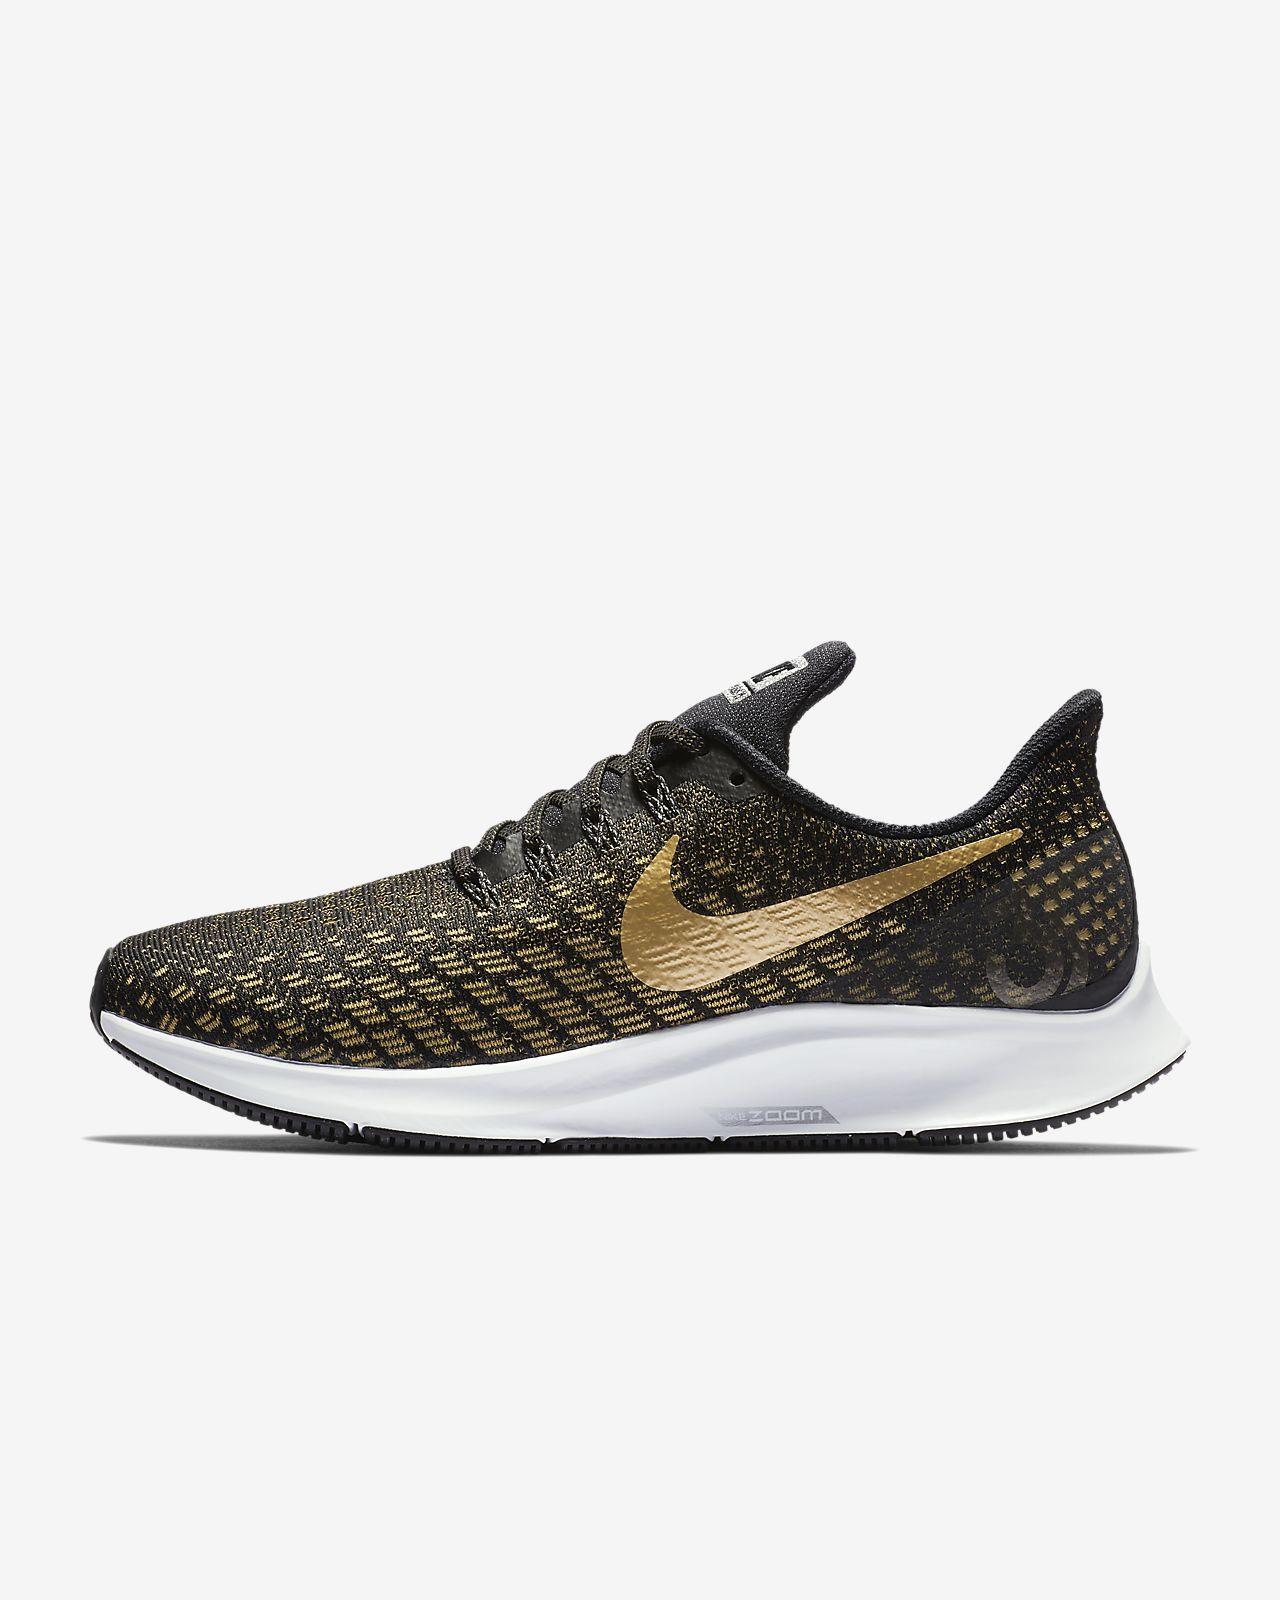 1687861a513 Nike Air Zoom Pegasus 35 Metallic Women s Running Shoe. Nike.com LU